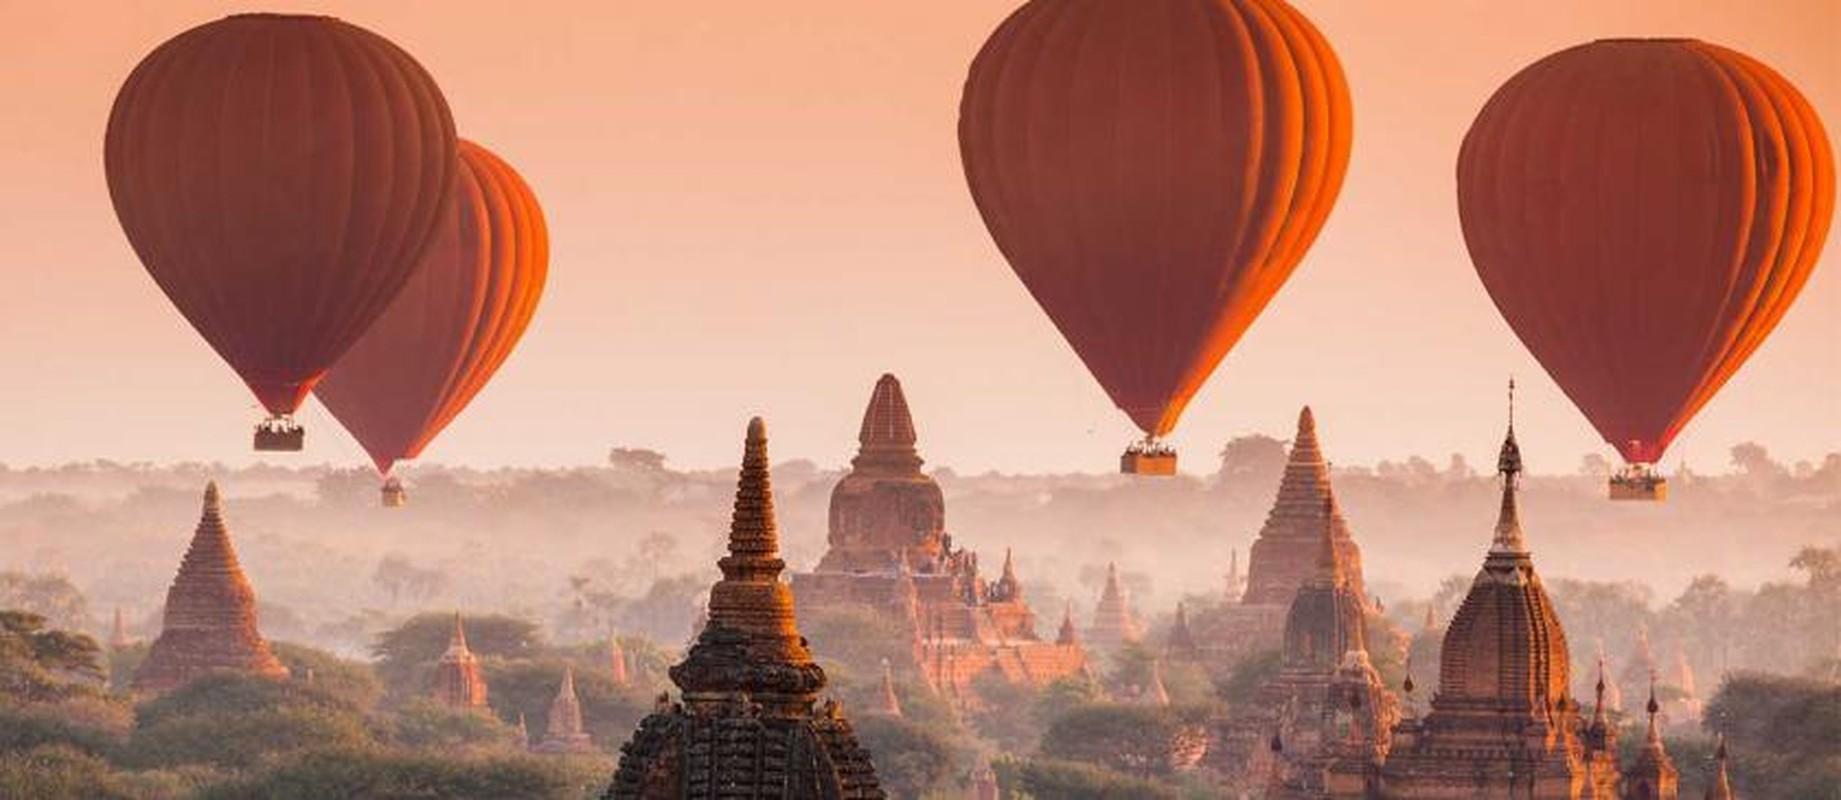 Vung dat co hang ngan ngoi den, bao thap linh thieng o Myanmar-Hinh-4